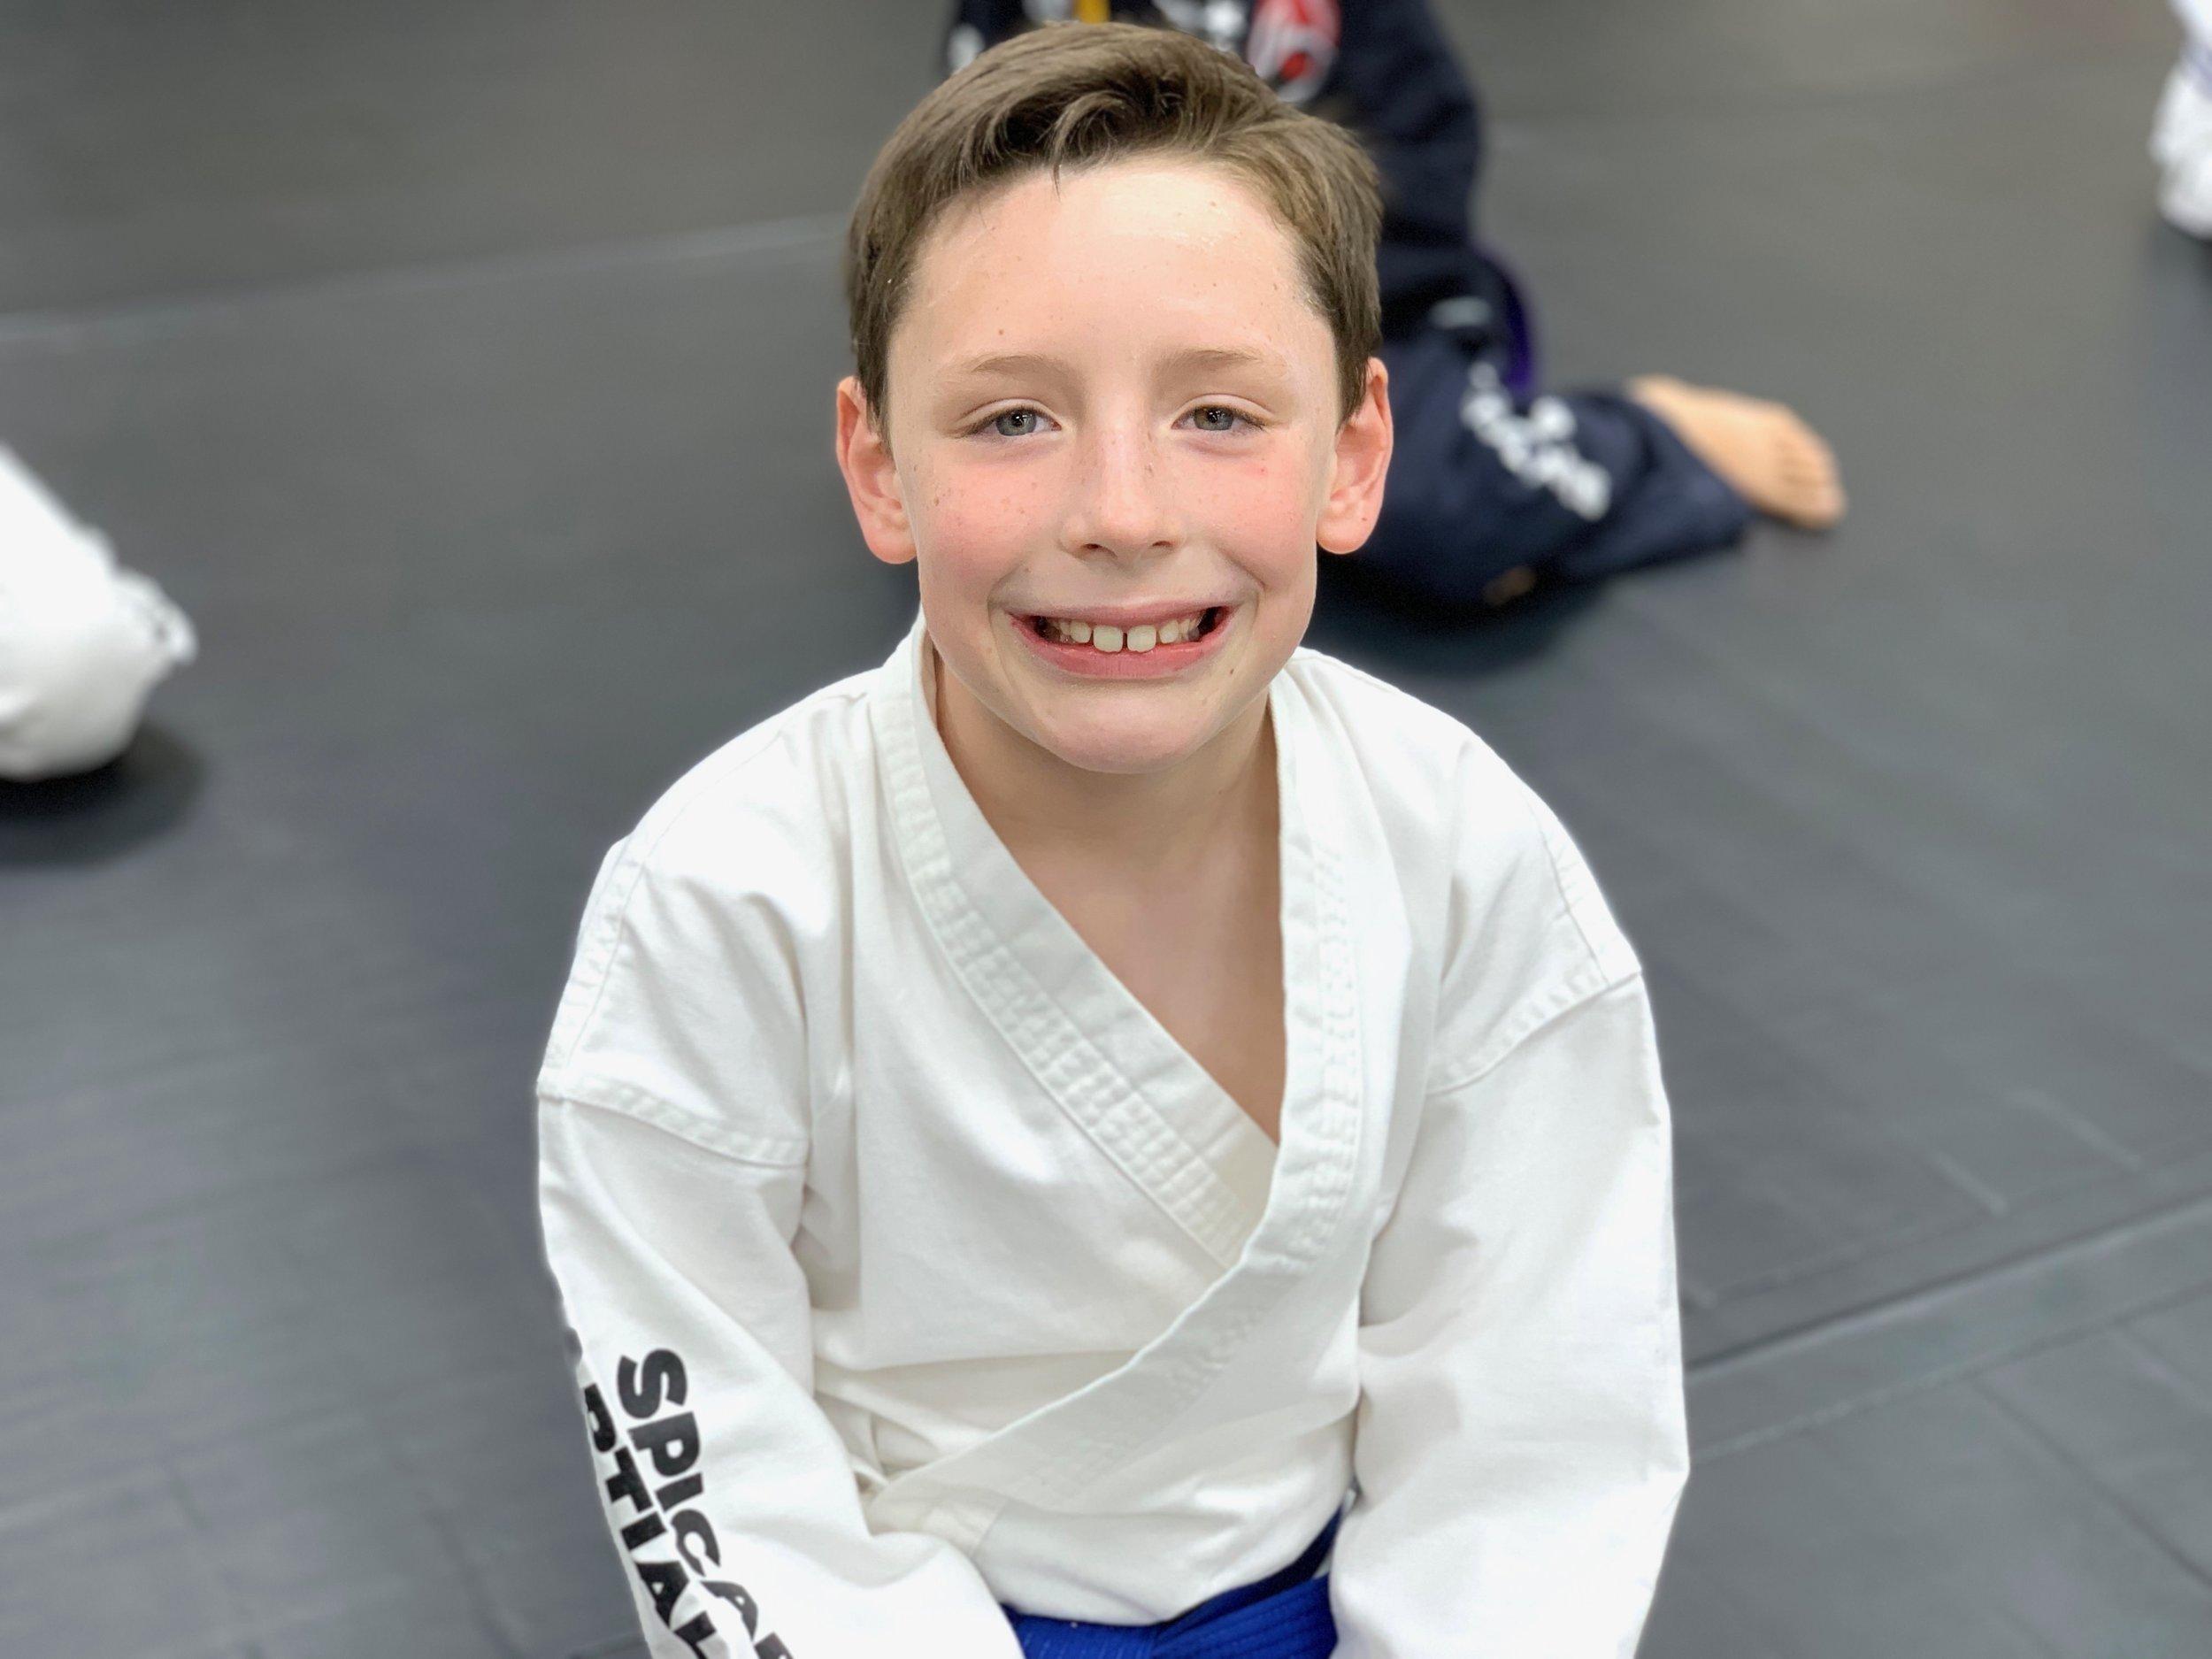 karate-kids-program-souhtlake-keller-grapevine-texas00018.jpeg